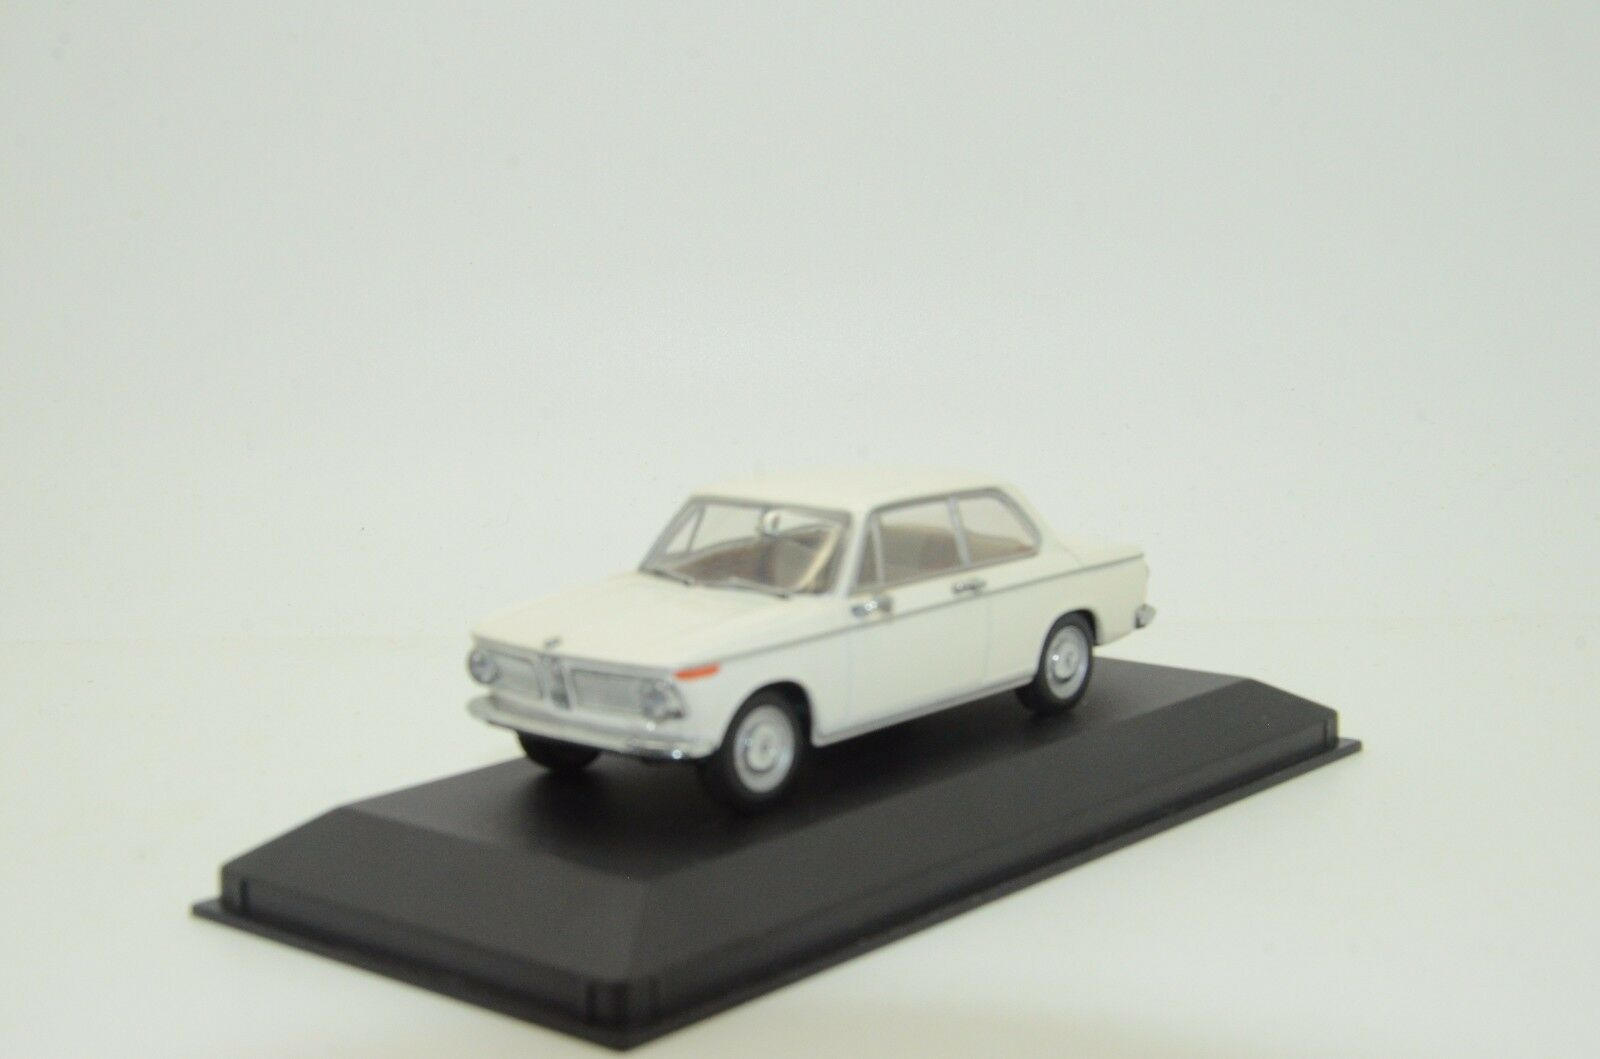 BMW 1600  2 Saloon 1966 -75 vit Minichamps 22104 1  43